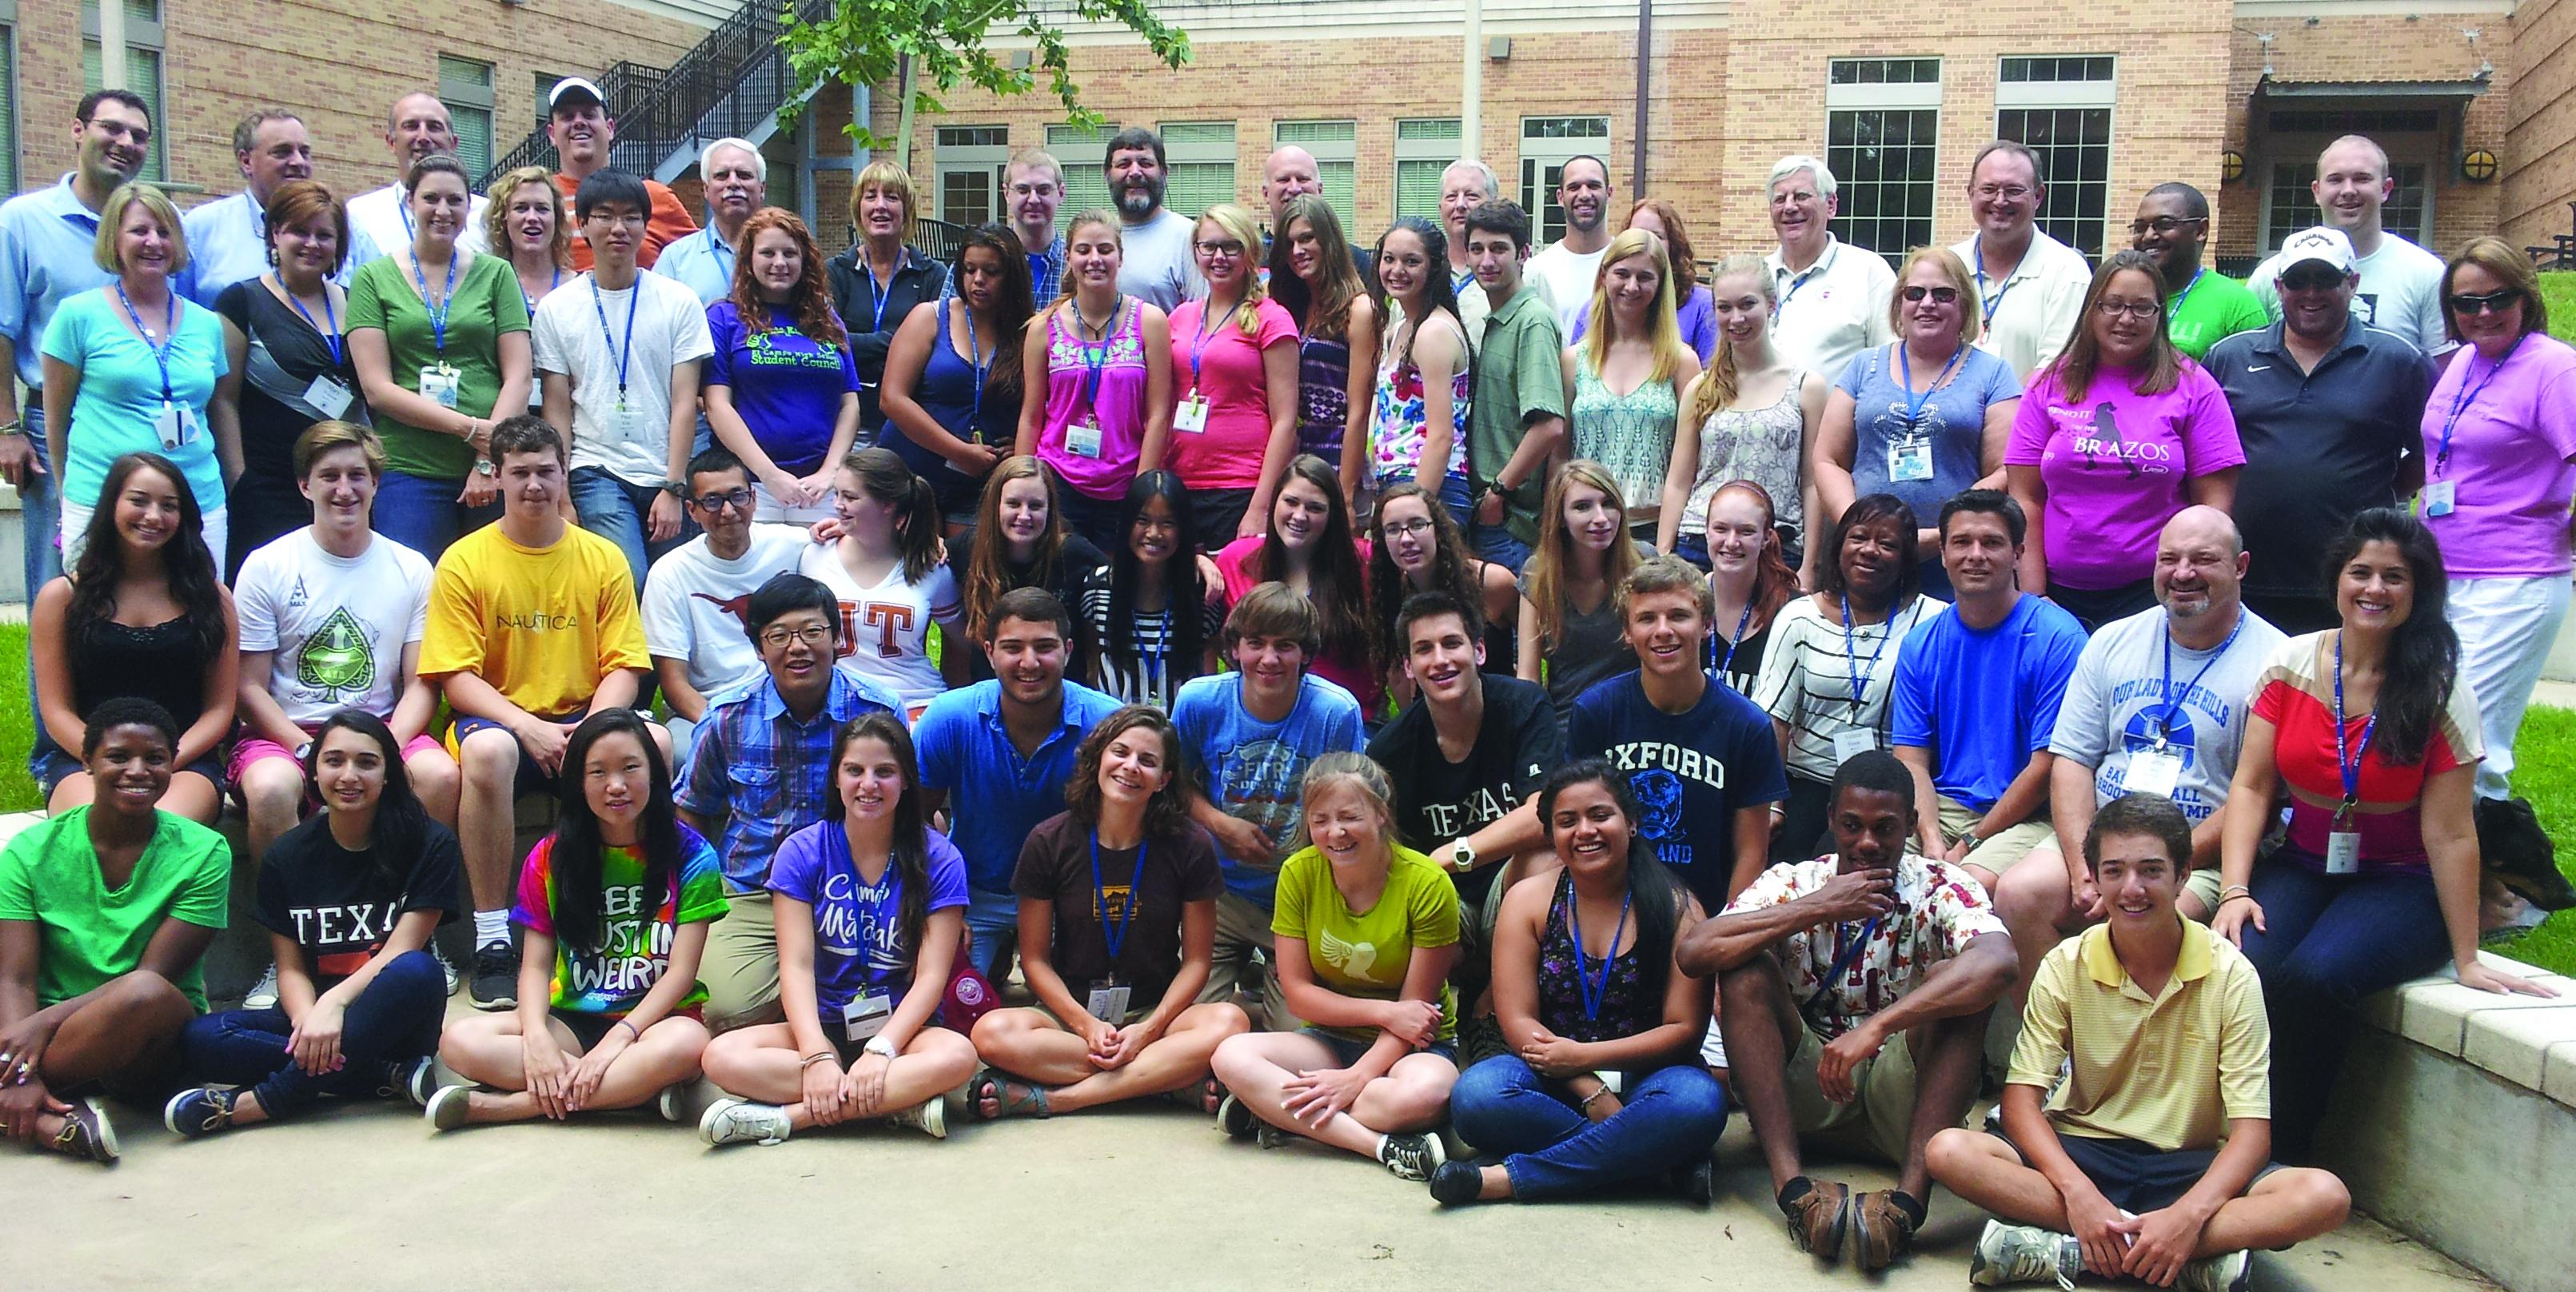 Summer Program - Management | Economics for Leaders @ Tufts University